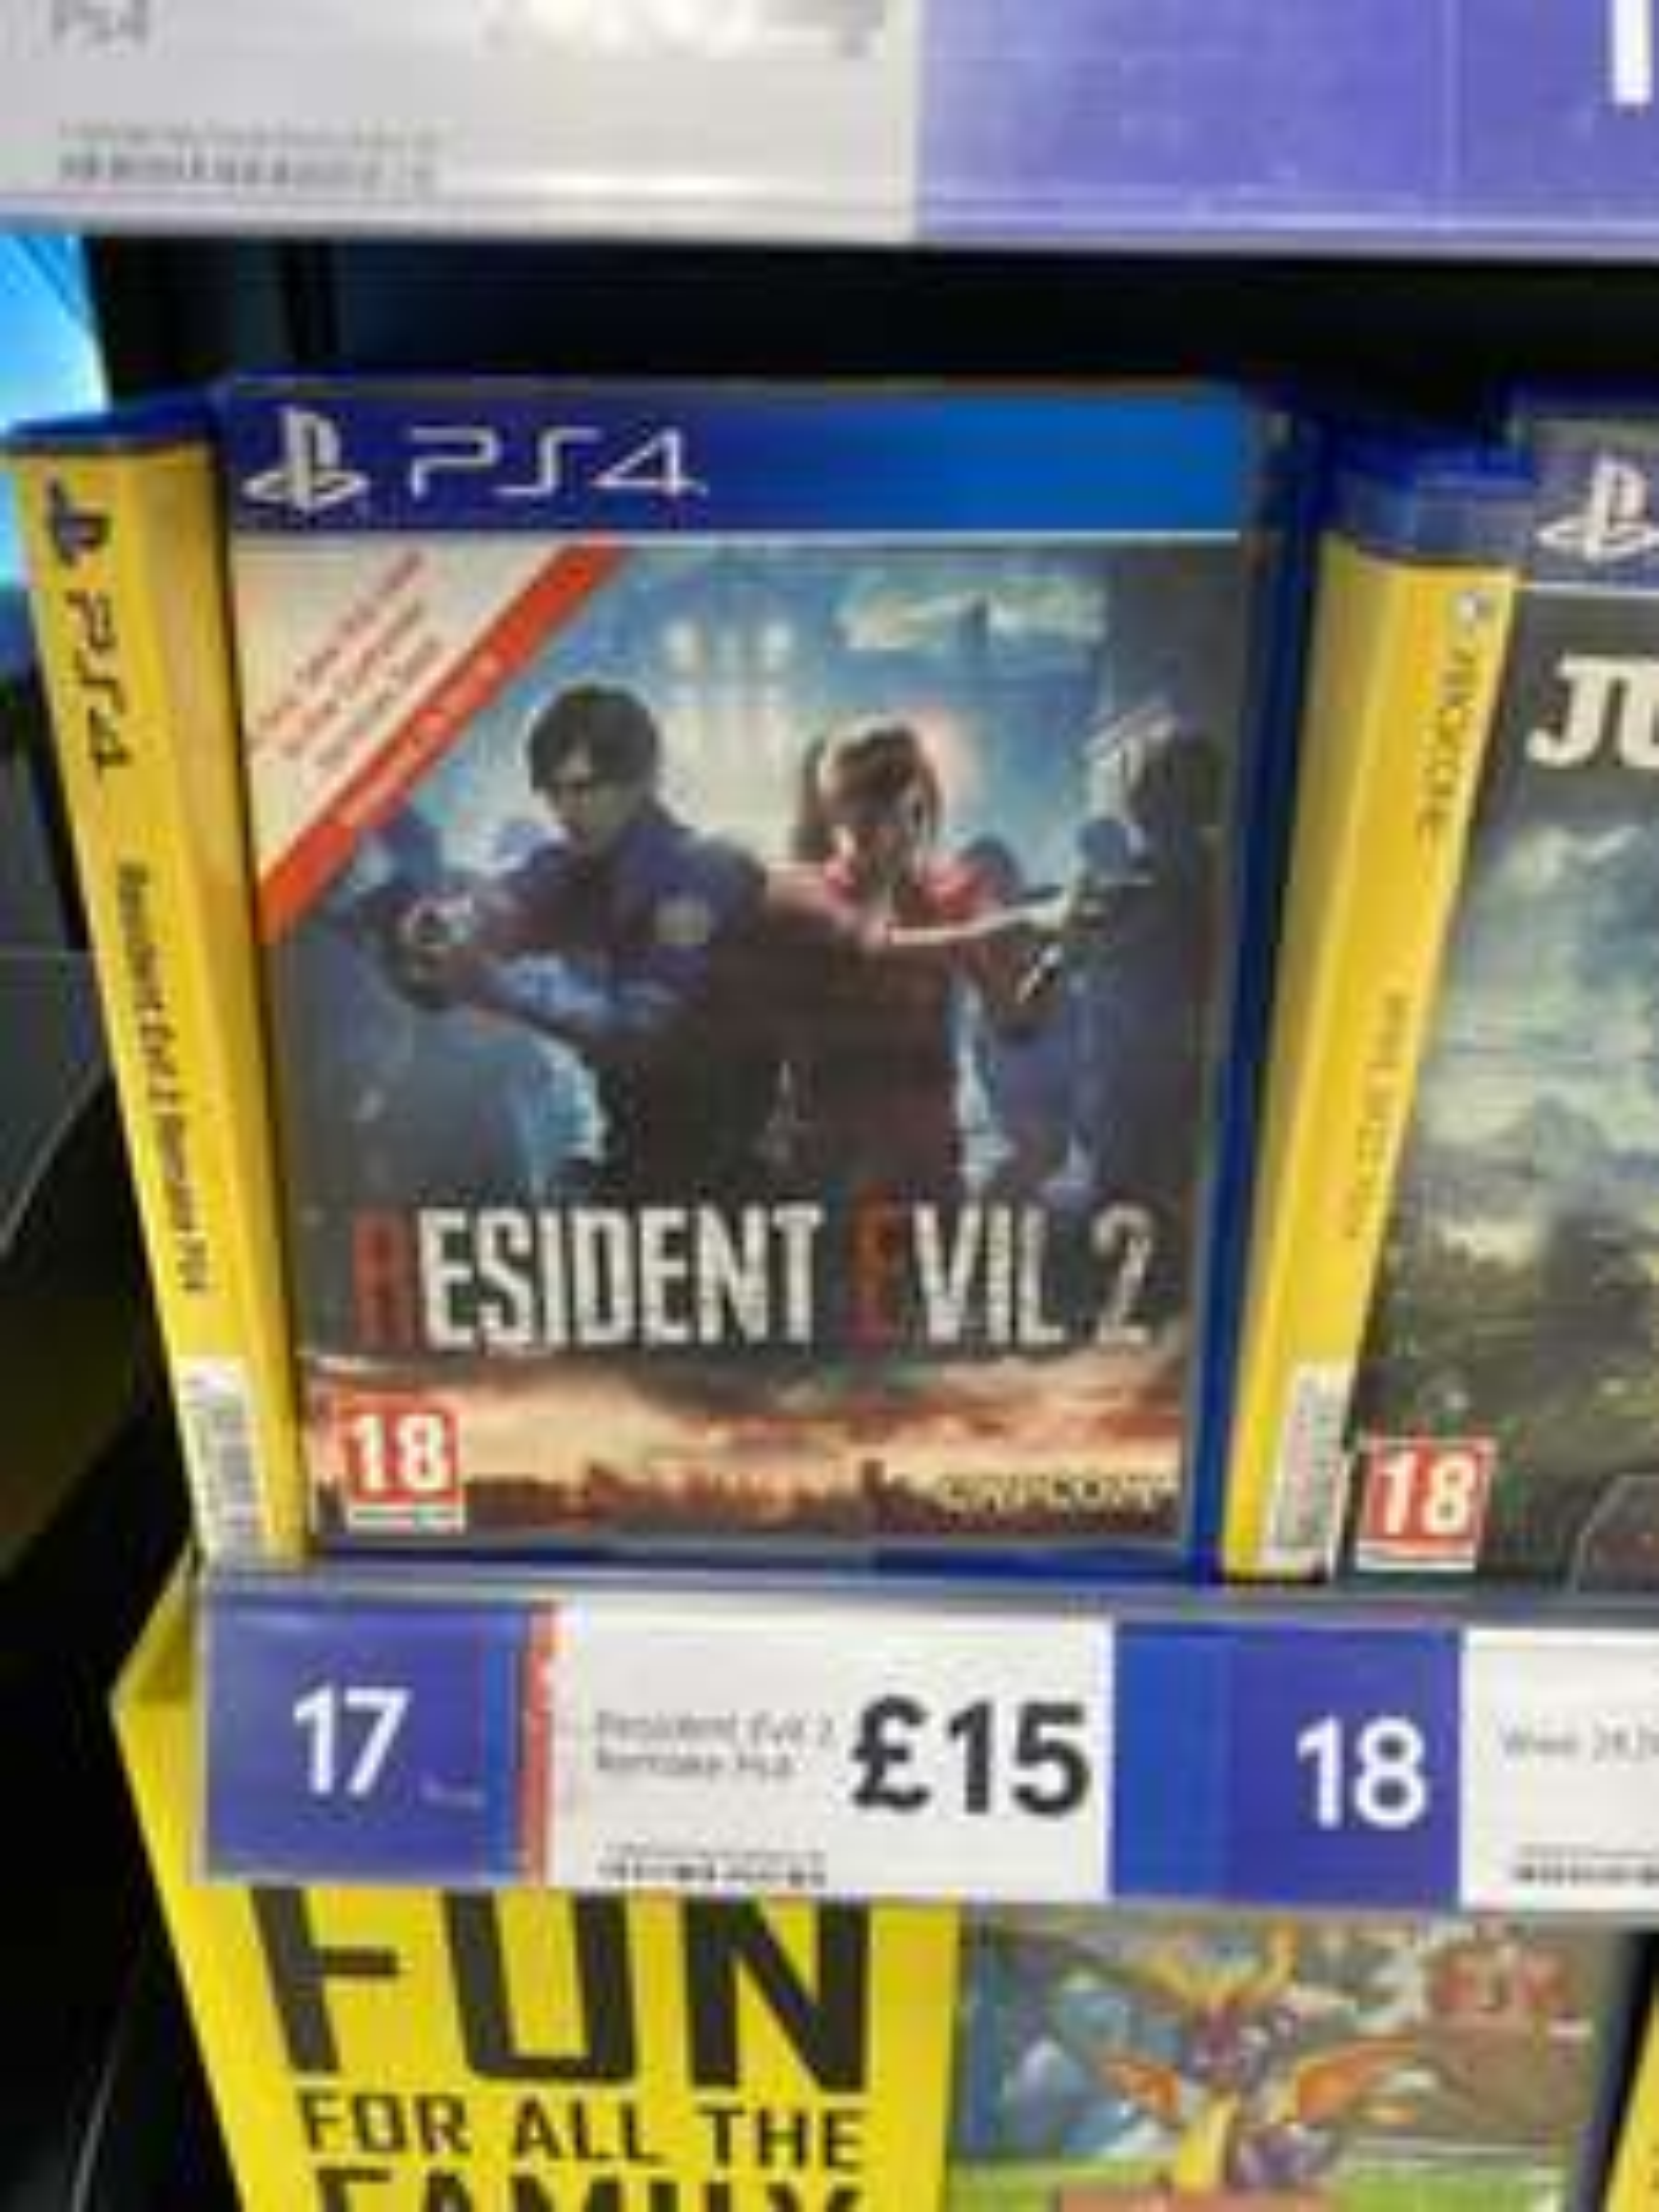 Resident Evil 2 Remake Playstation 4 / PS4 £15 at Tesco